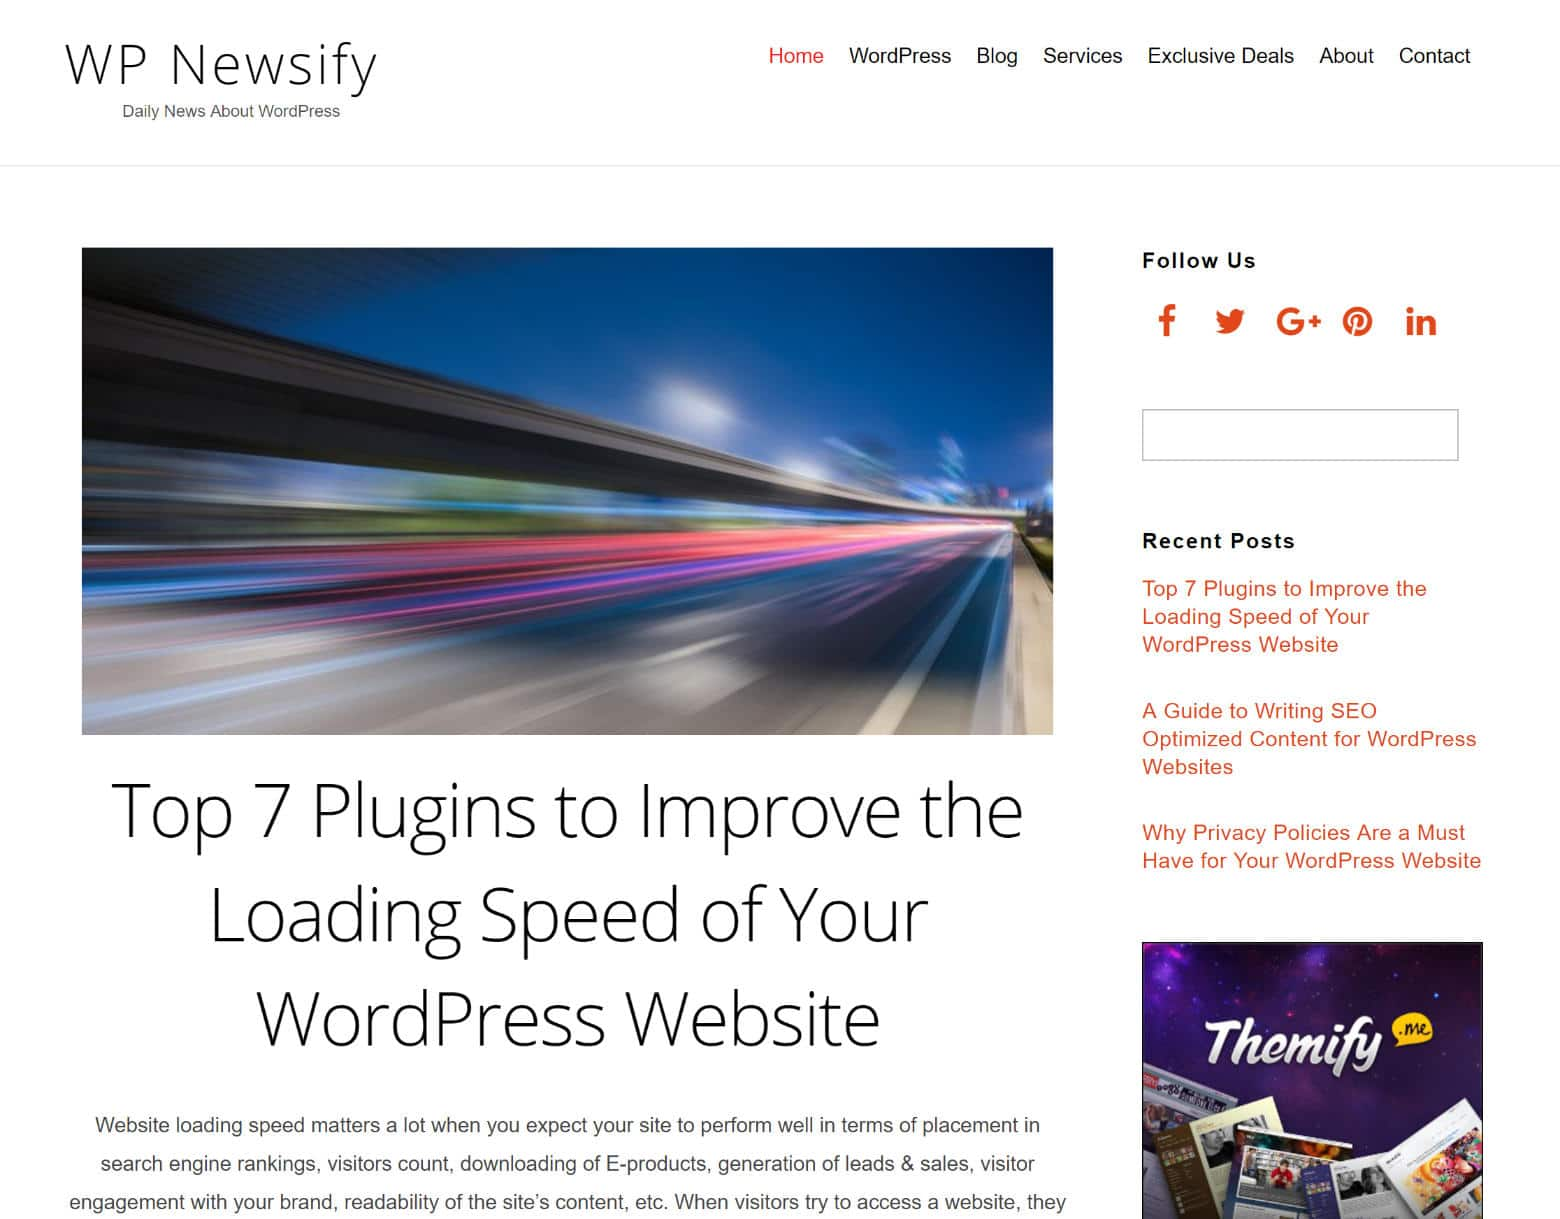 WP Newsify